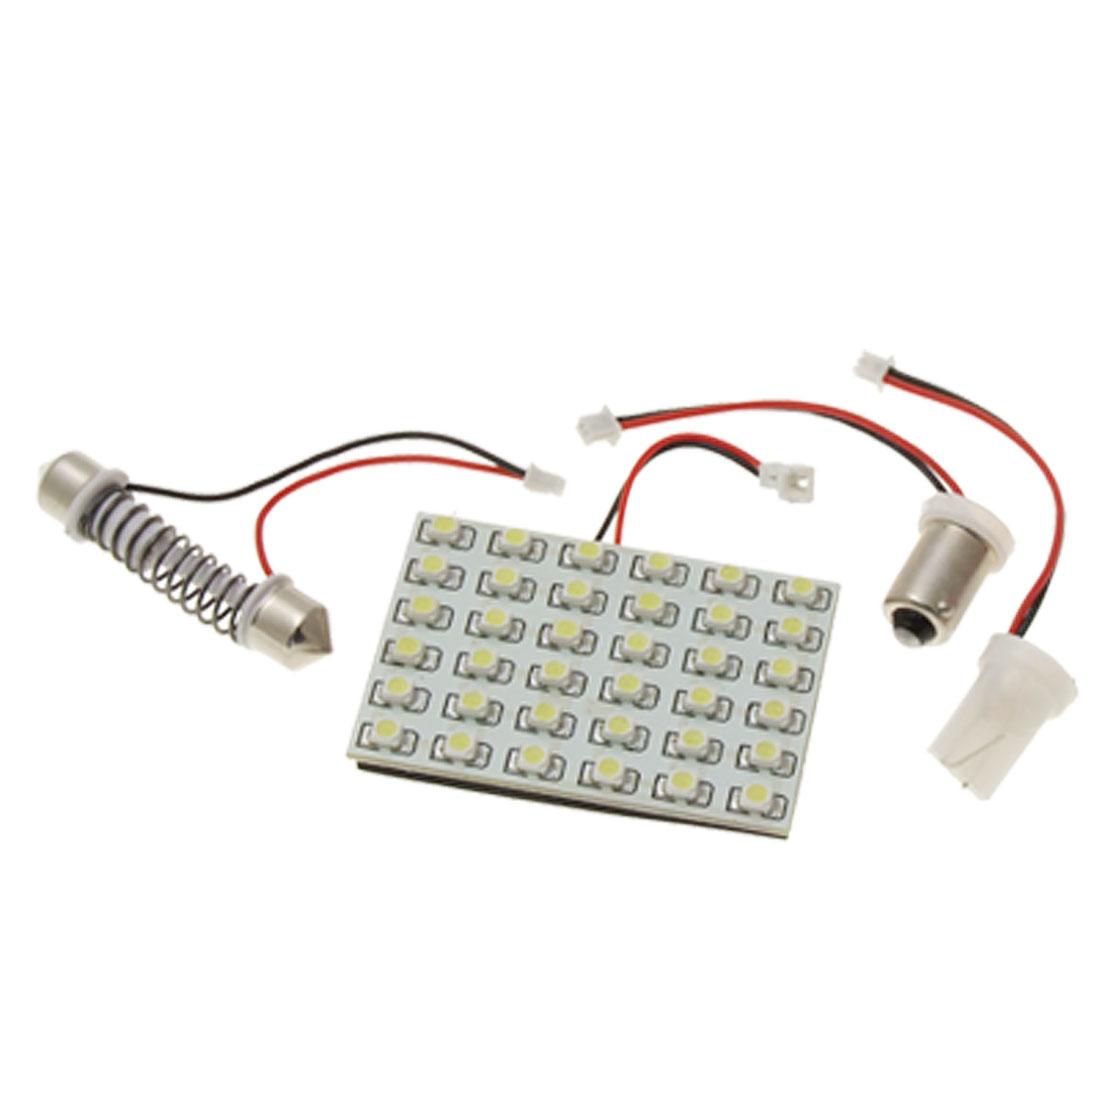 Auto Car 36 LED T10 Festoon Interior Dome Light Lamp w Adapter